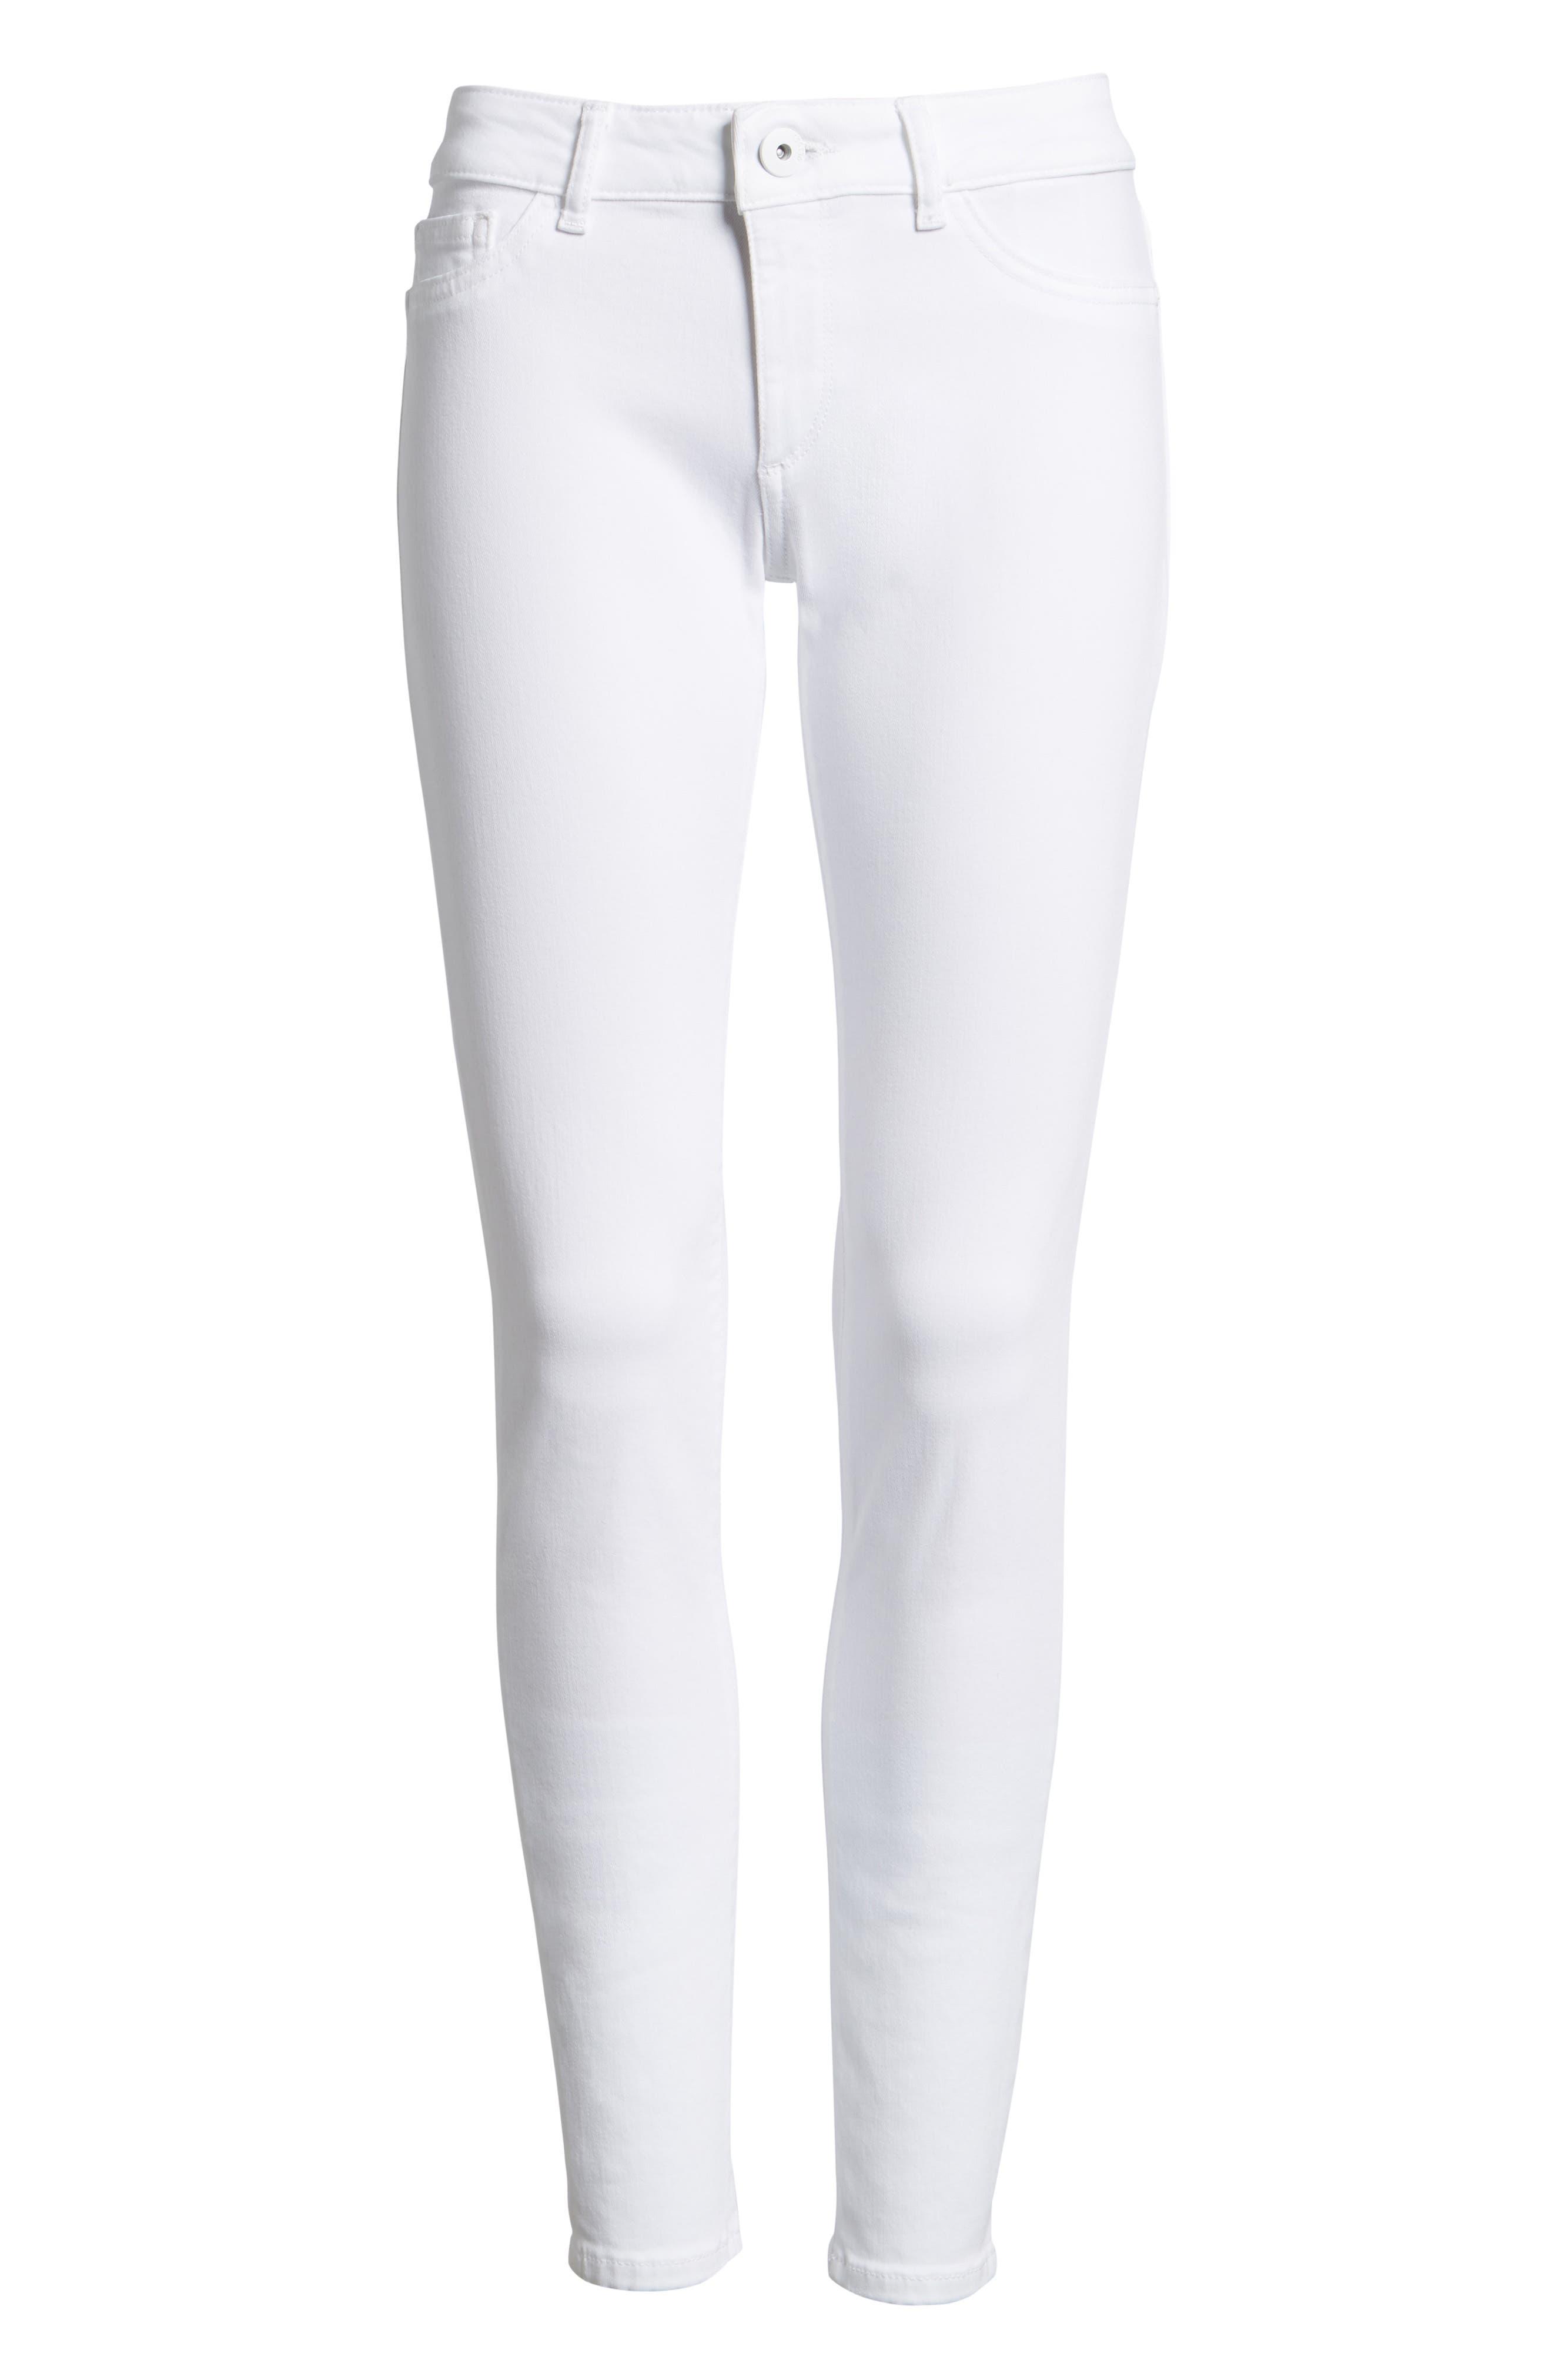 'Emma' Power Legging Jeans,                             Main thumbnail 1, color,                             100